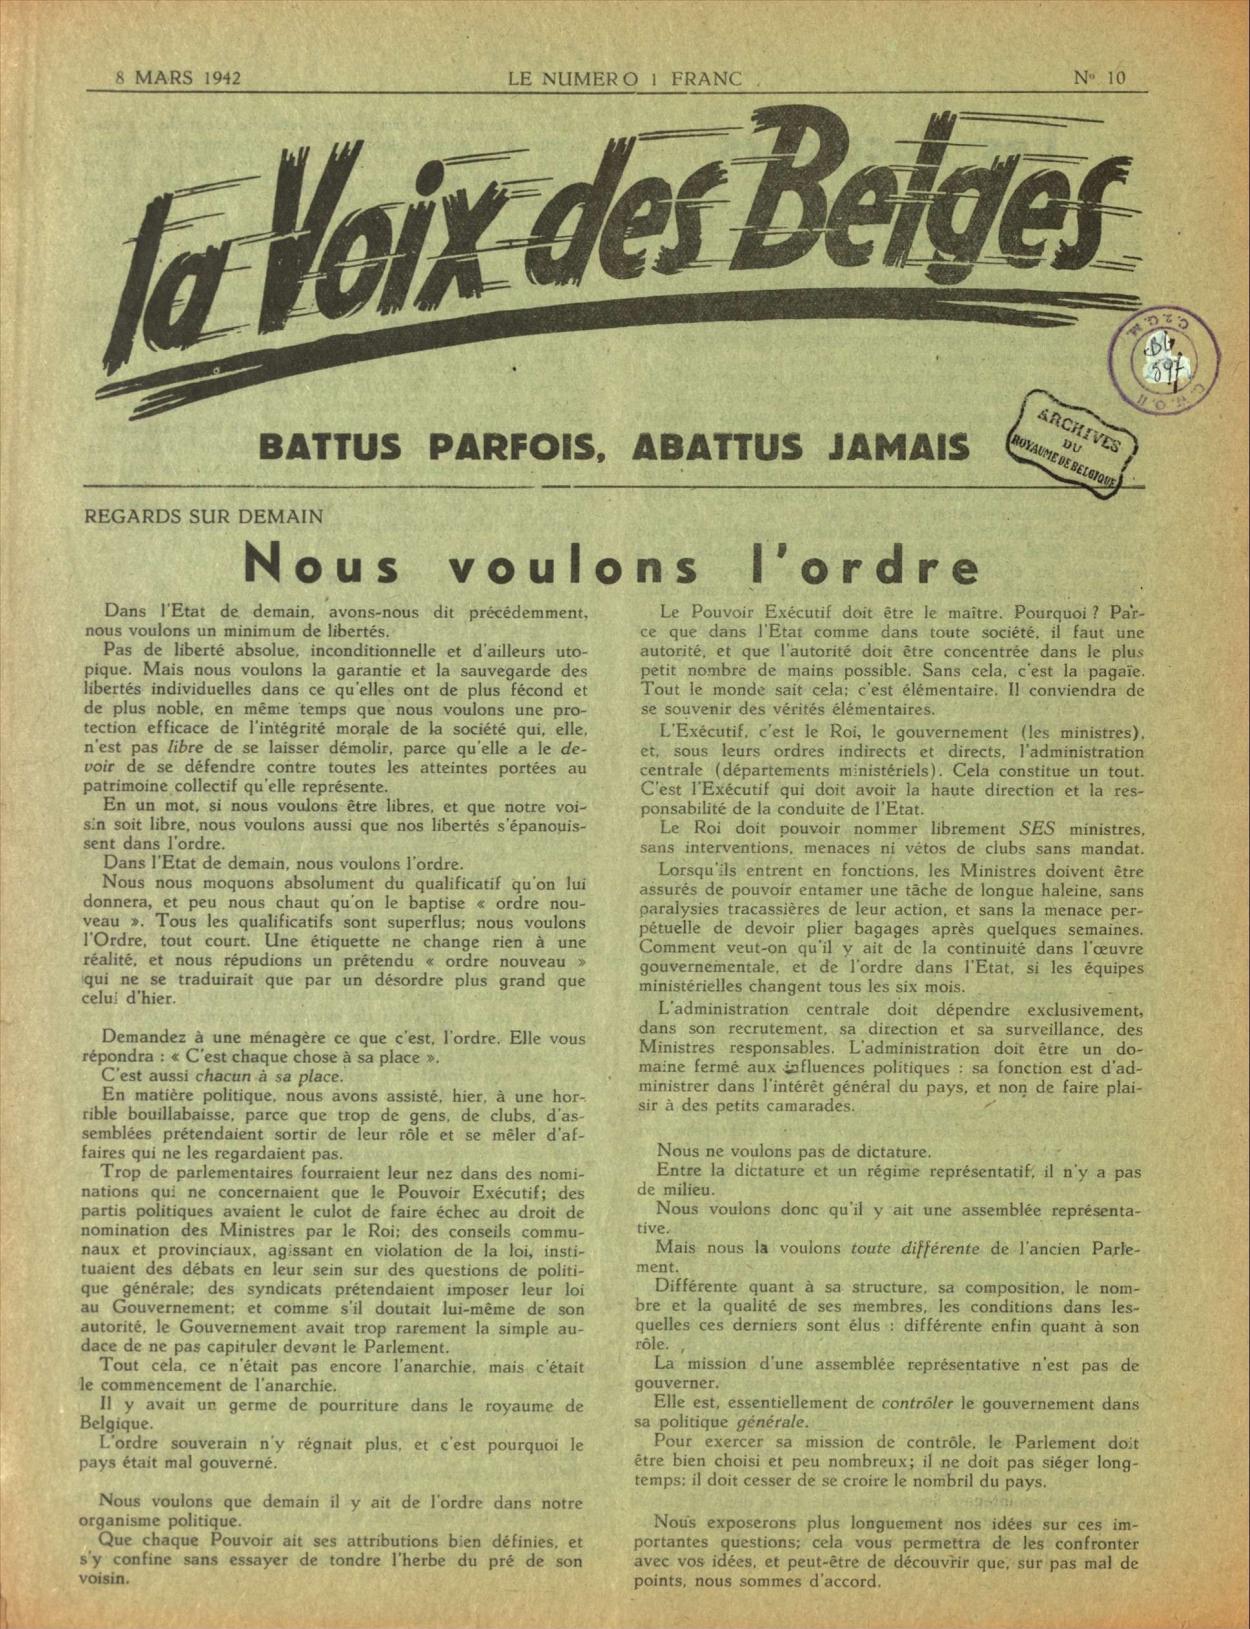 soma_bg597_1942-03-08_01_010-00001-la-voix-8-3-1942.jpg